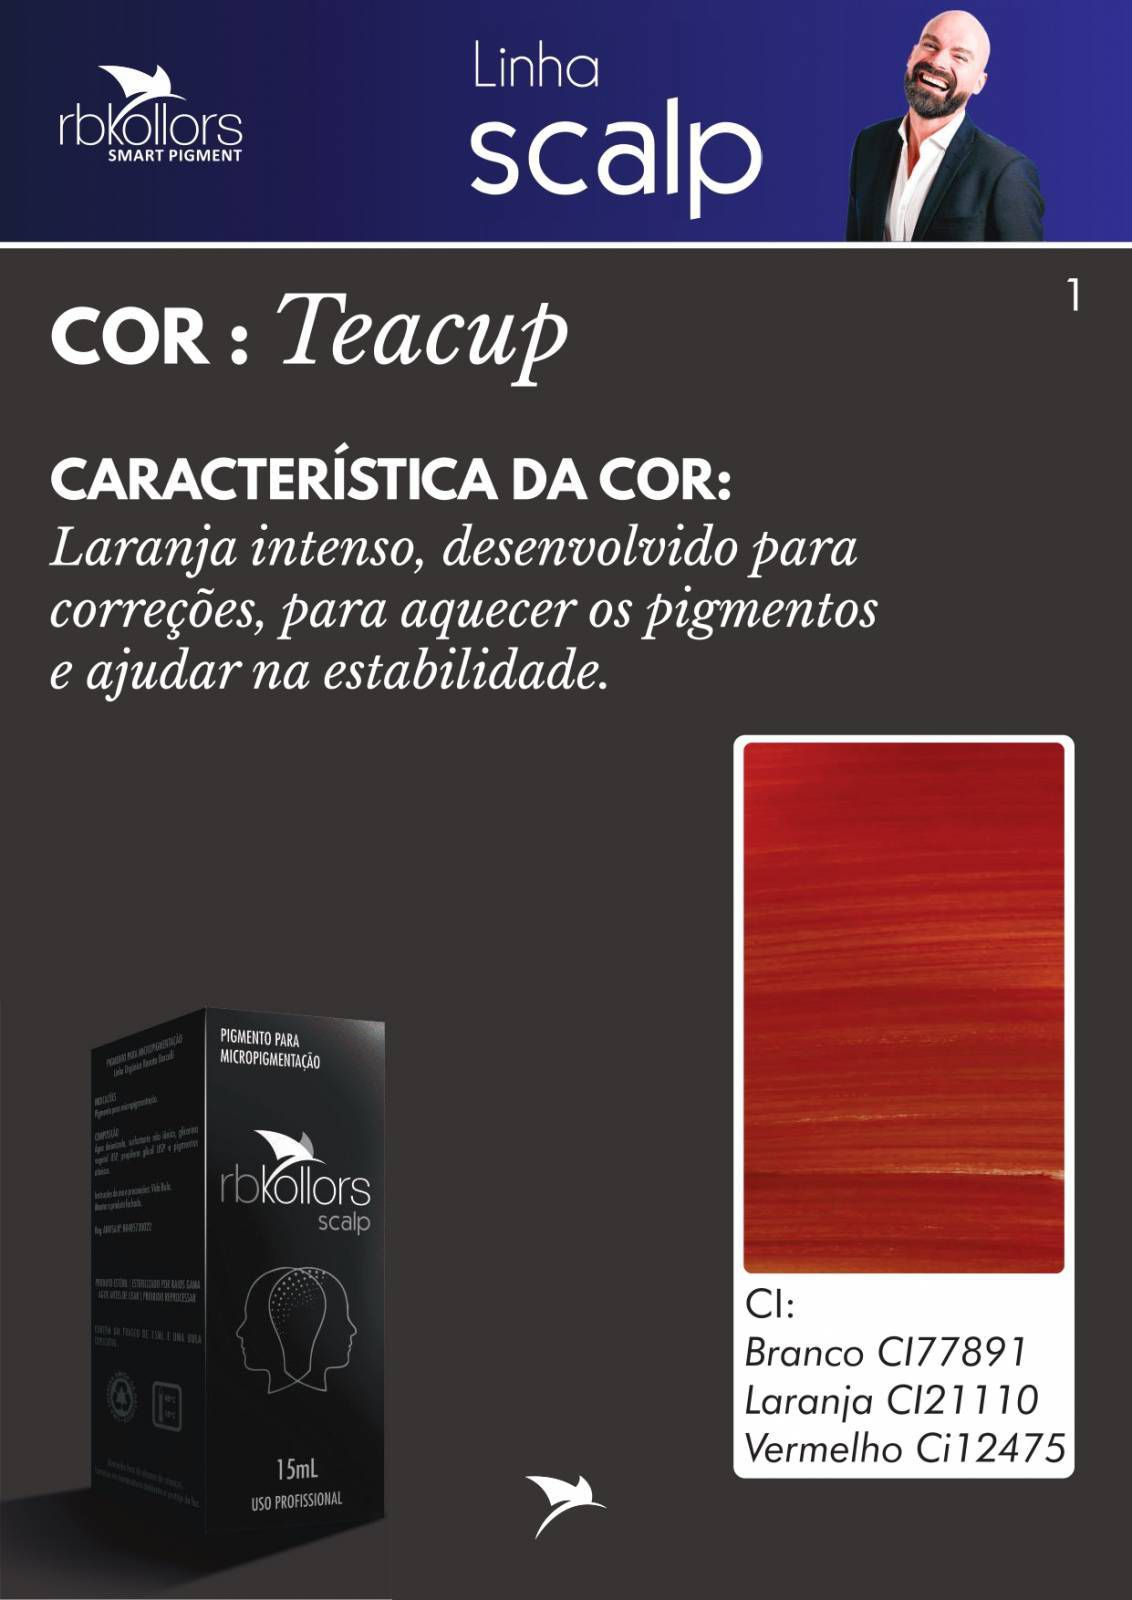 PIGMENTO RB KOLLORS  - SCALP TEACUP (15ML)  - Misstética